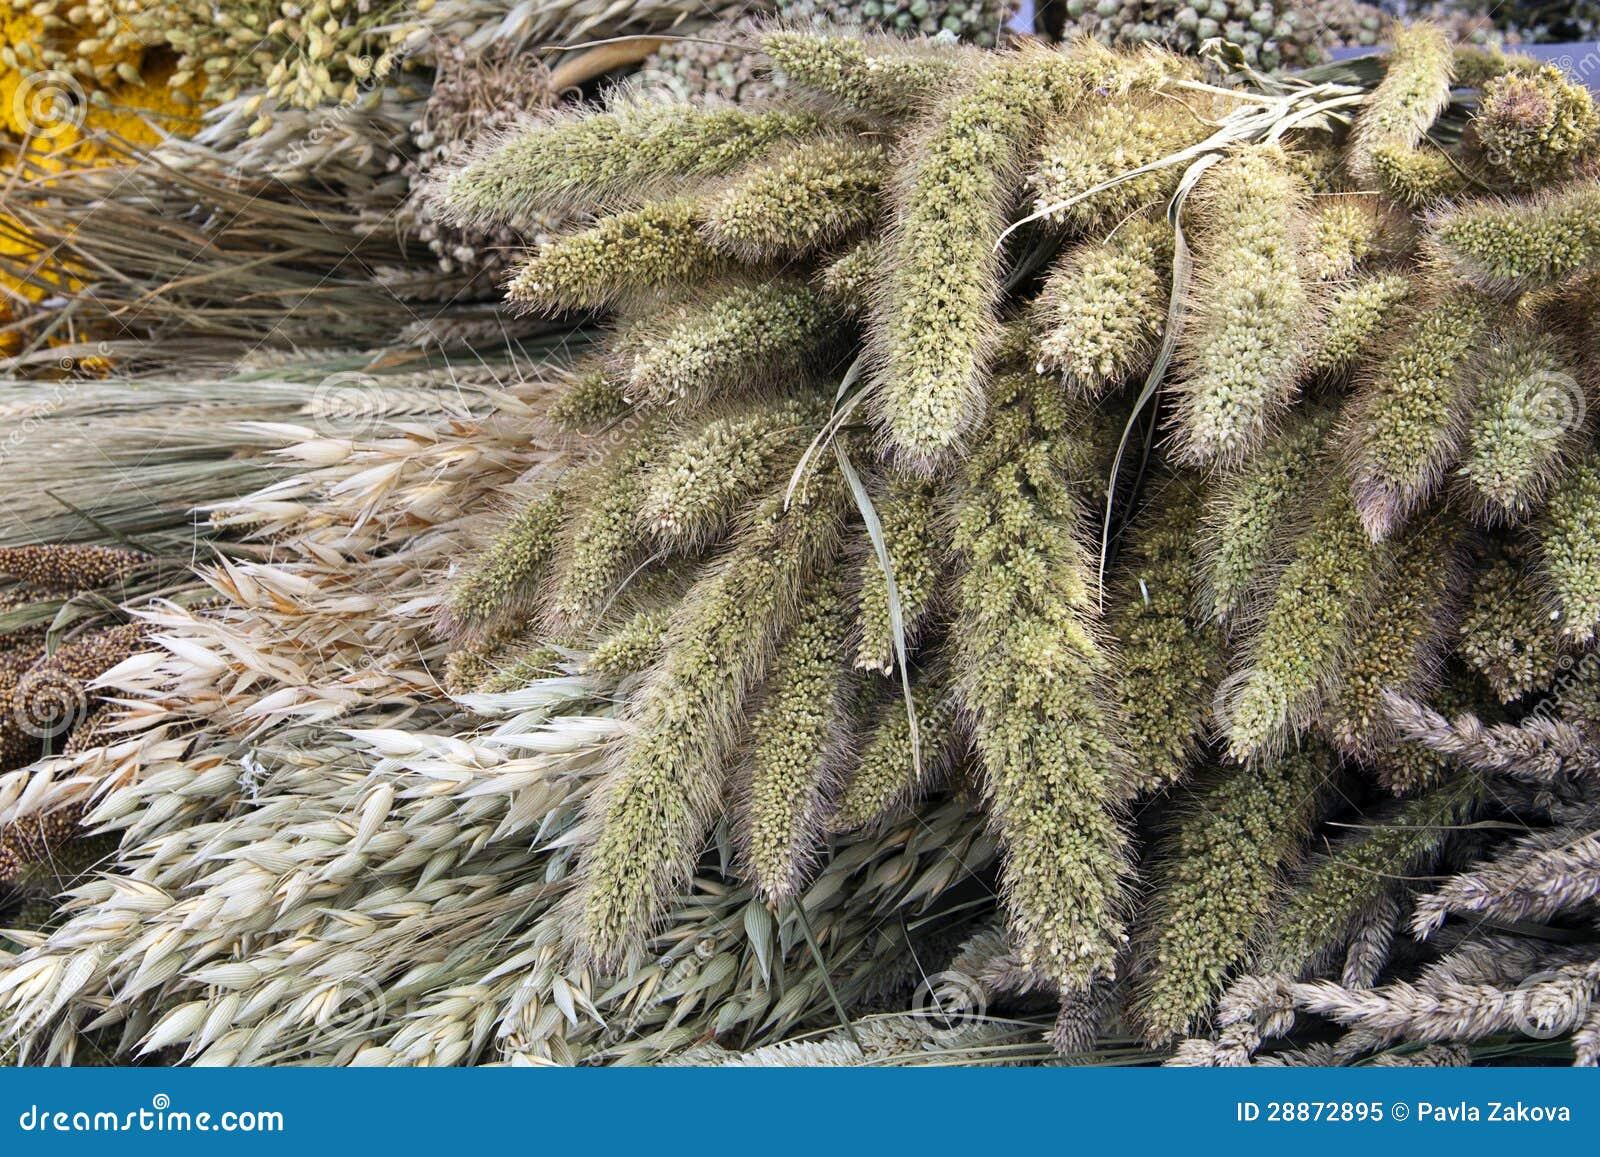 Dry grain plants